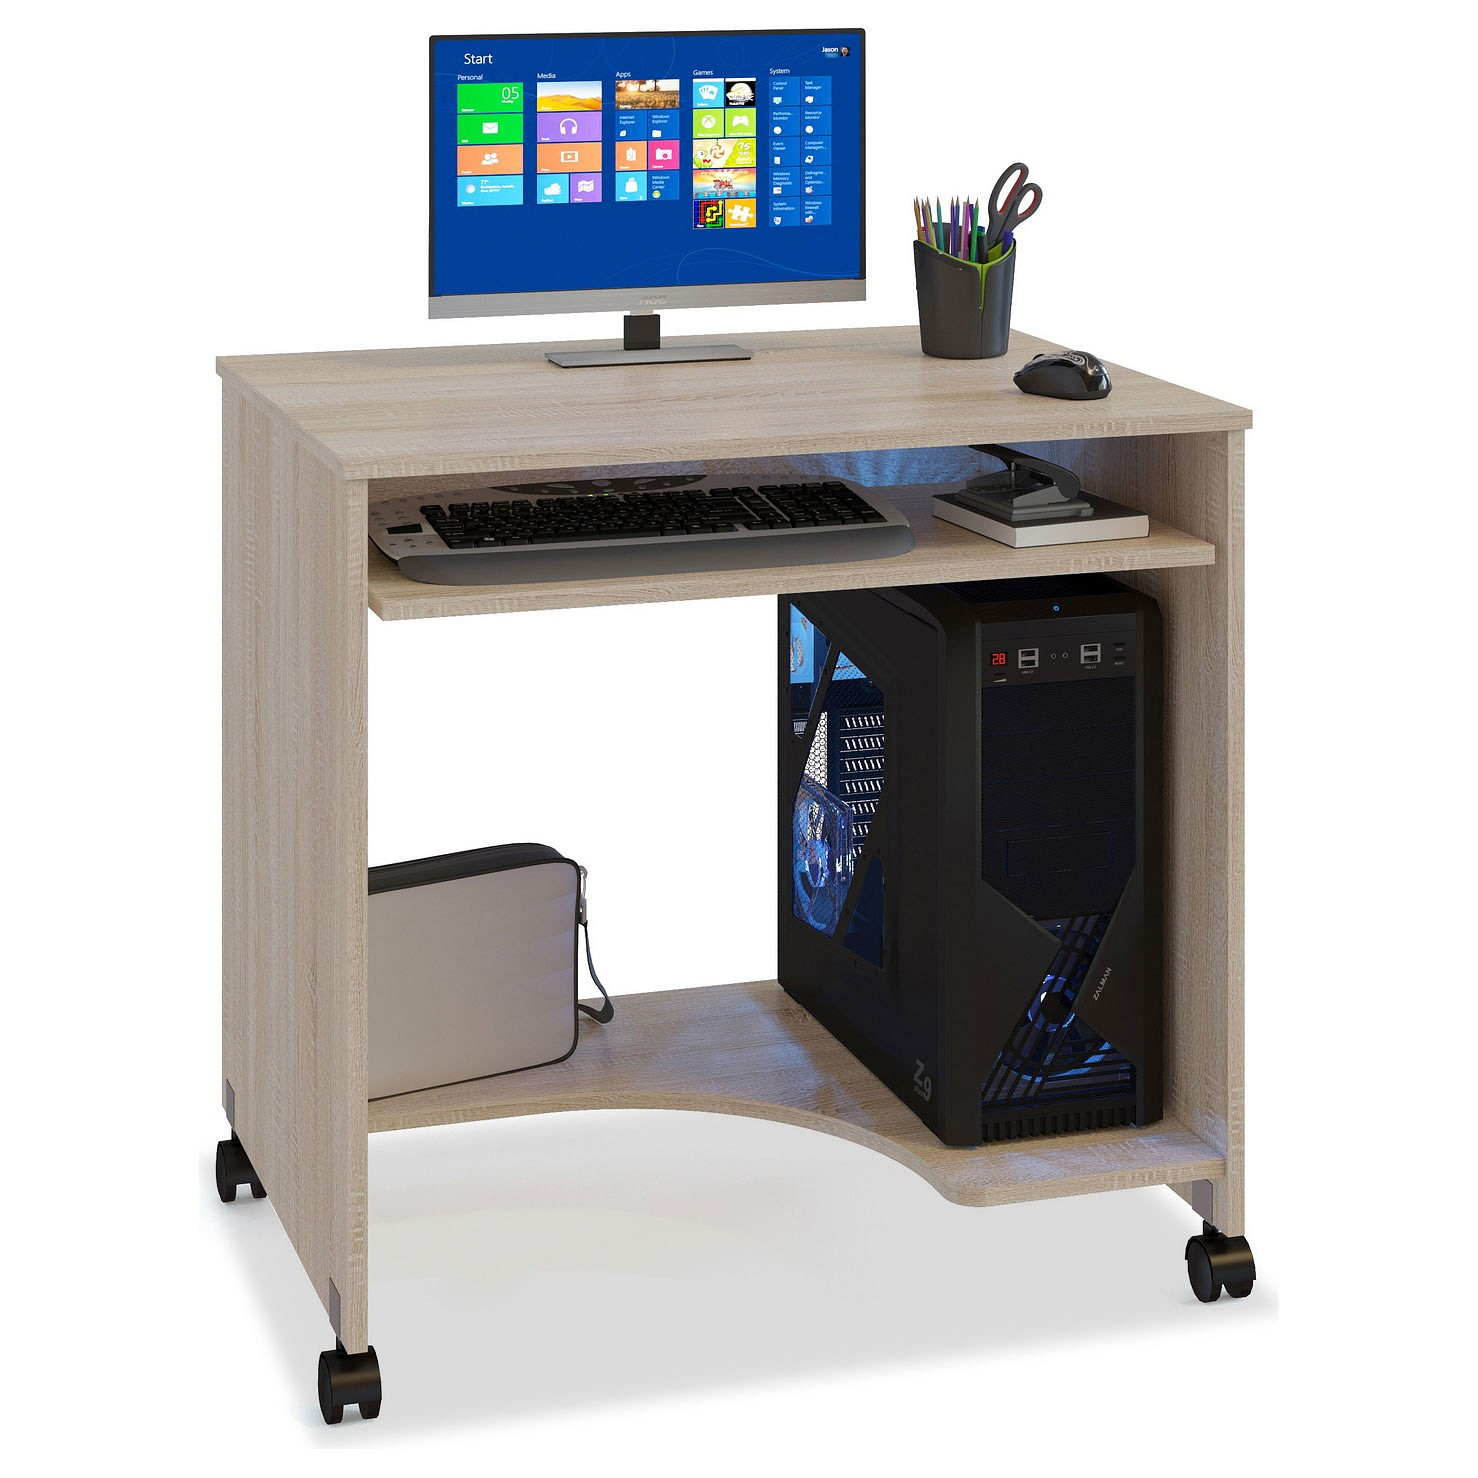 Компьютерный стол СОКОЛ КСТ-15 80x60x77, дуб сонома